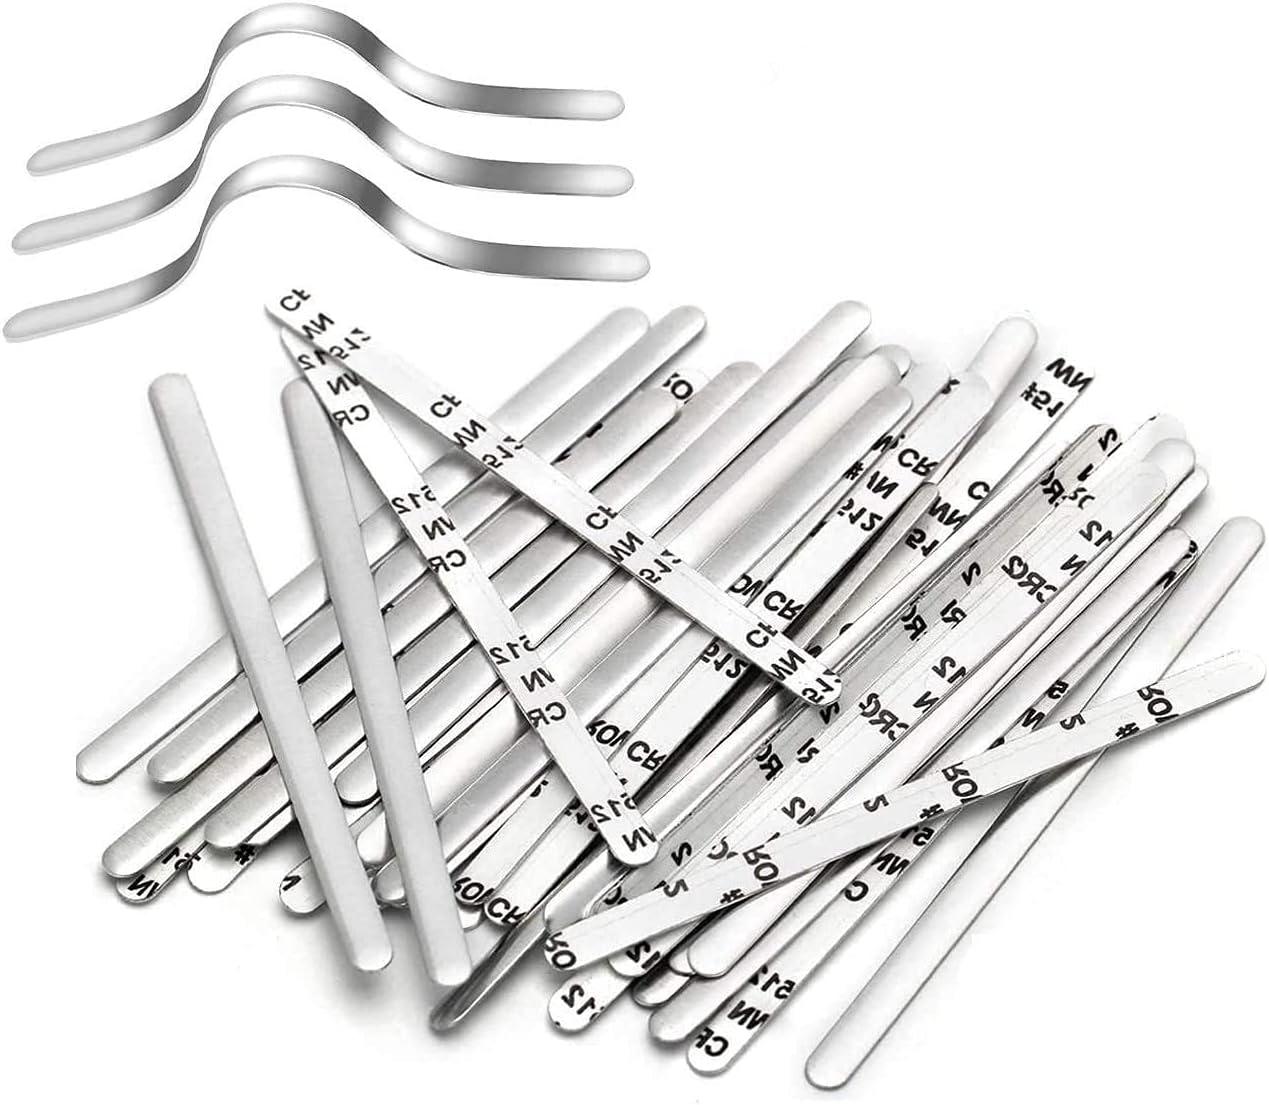 Nose Bridge OFFicial site Strips Aluminum Very popular! C Metal Adjustable Strip